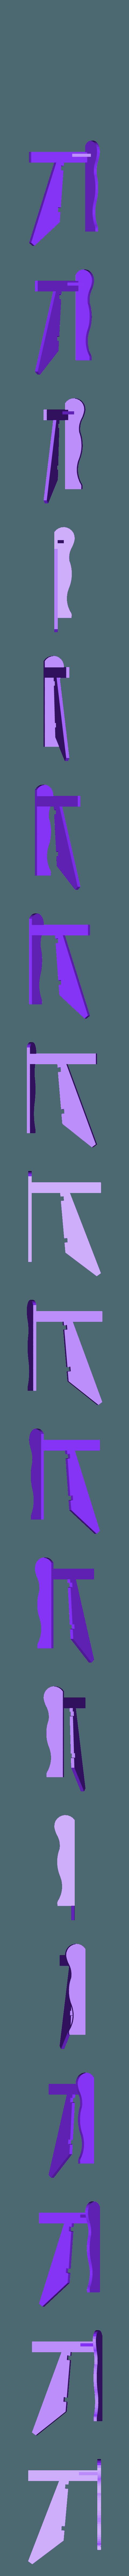 Left_Arm.stl Download free STL file Adirondack Chair • 3D printing design, Lurgmog